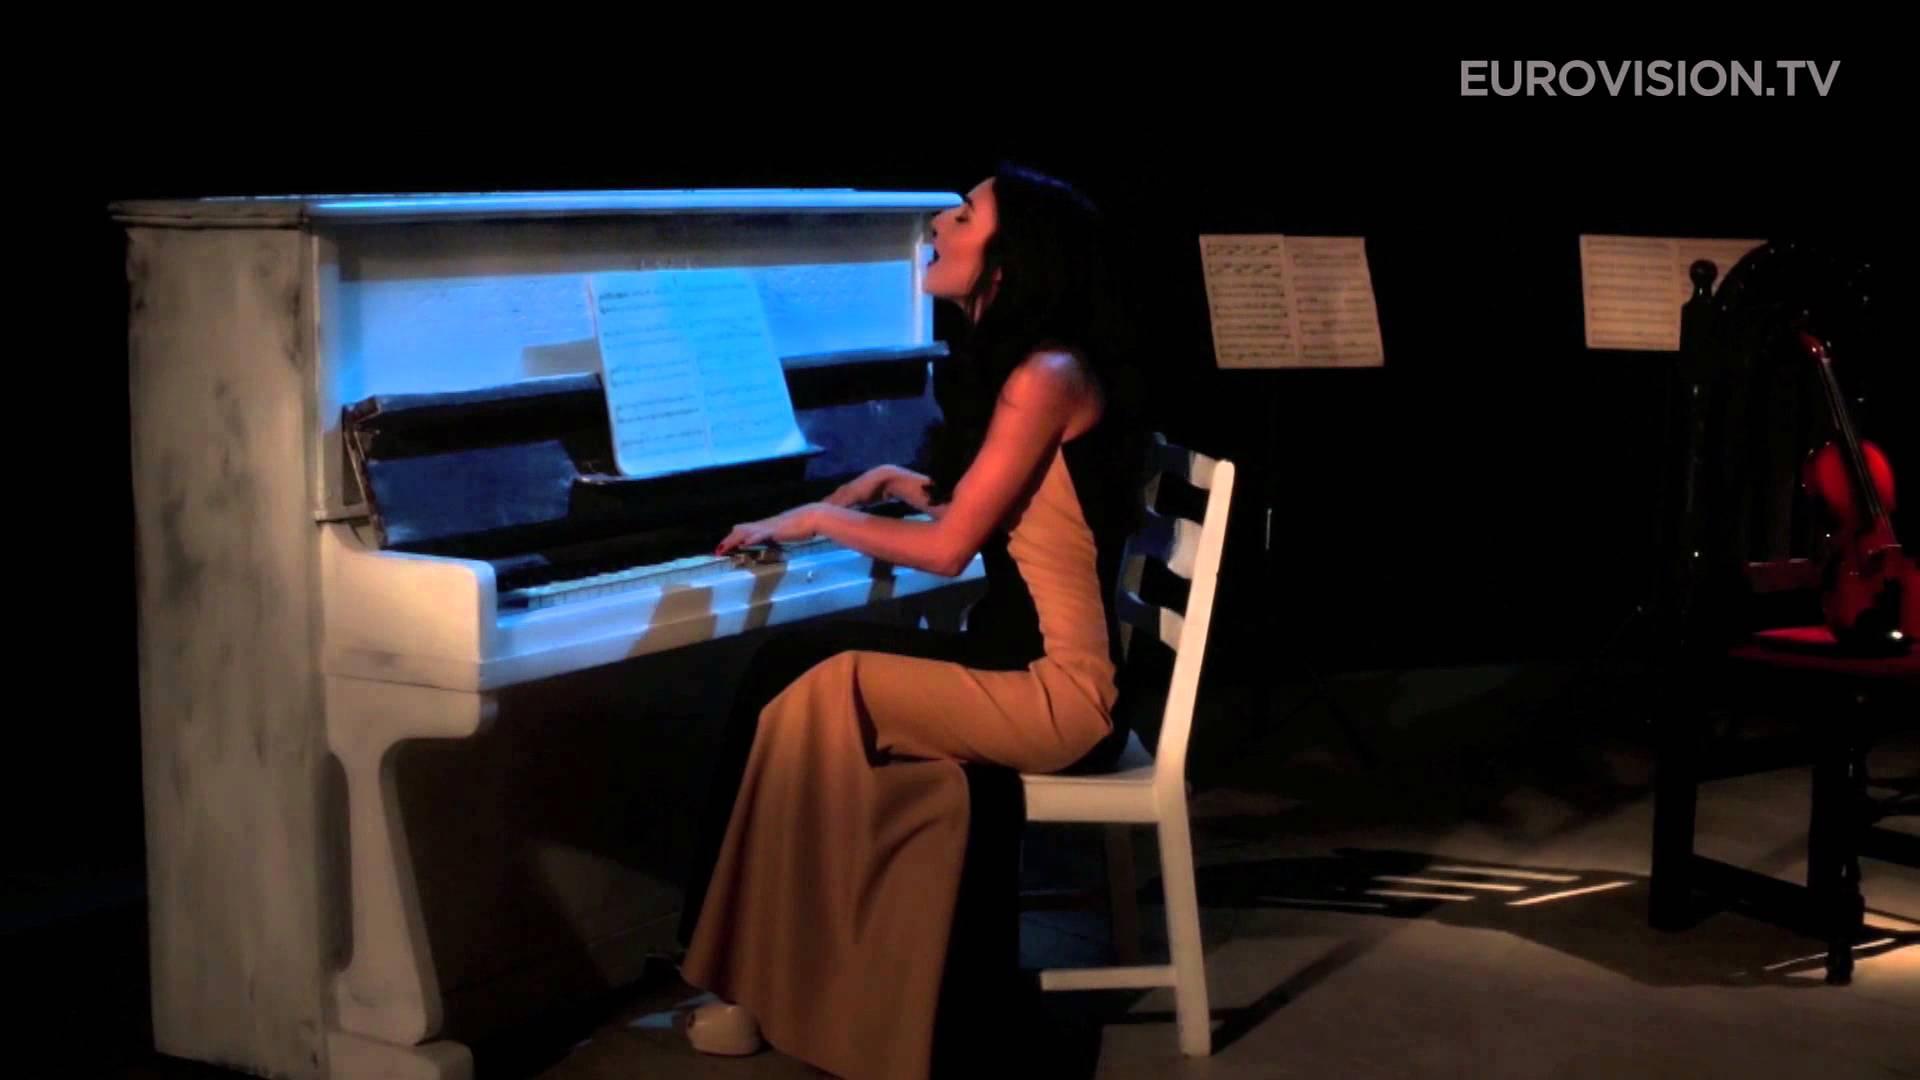 ESC 2014: Aserbaidschan – Dilara Kazimova